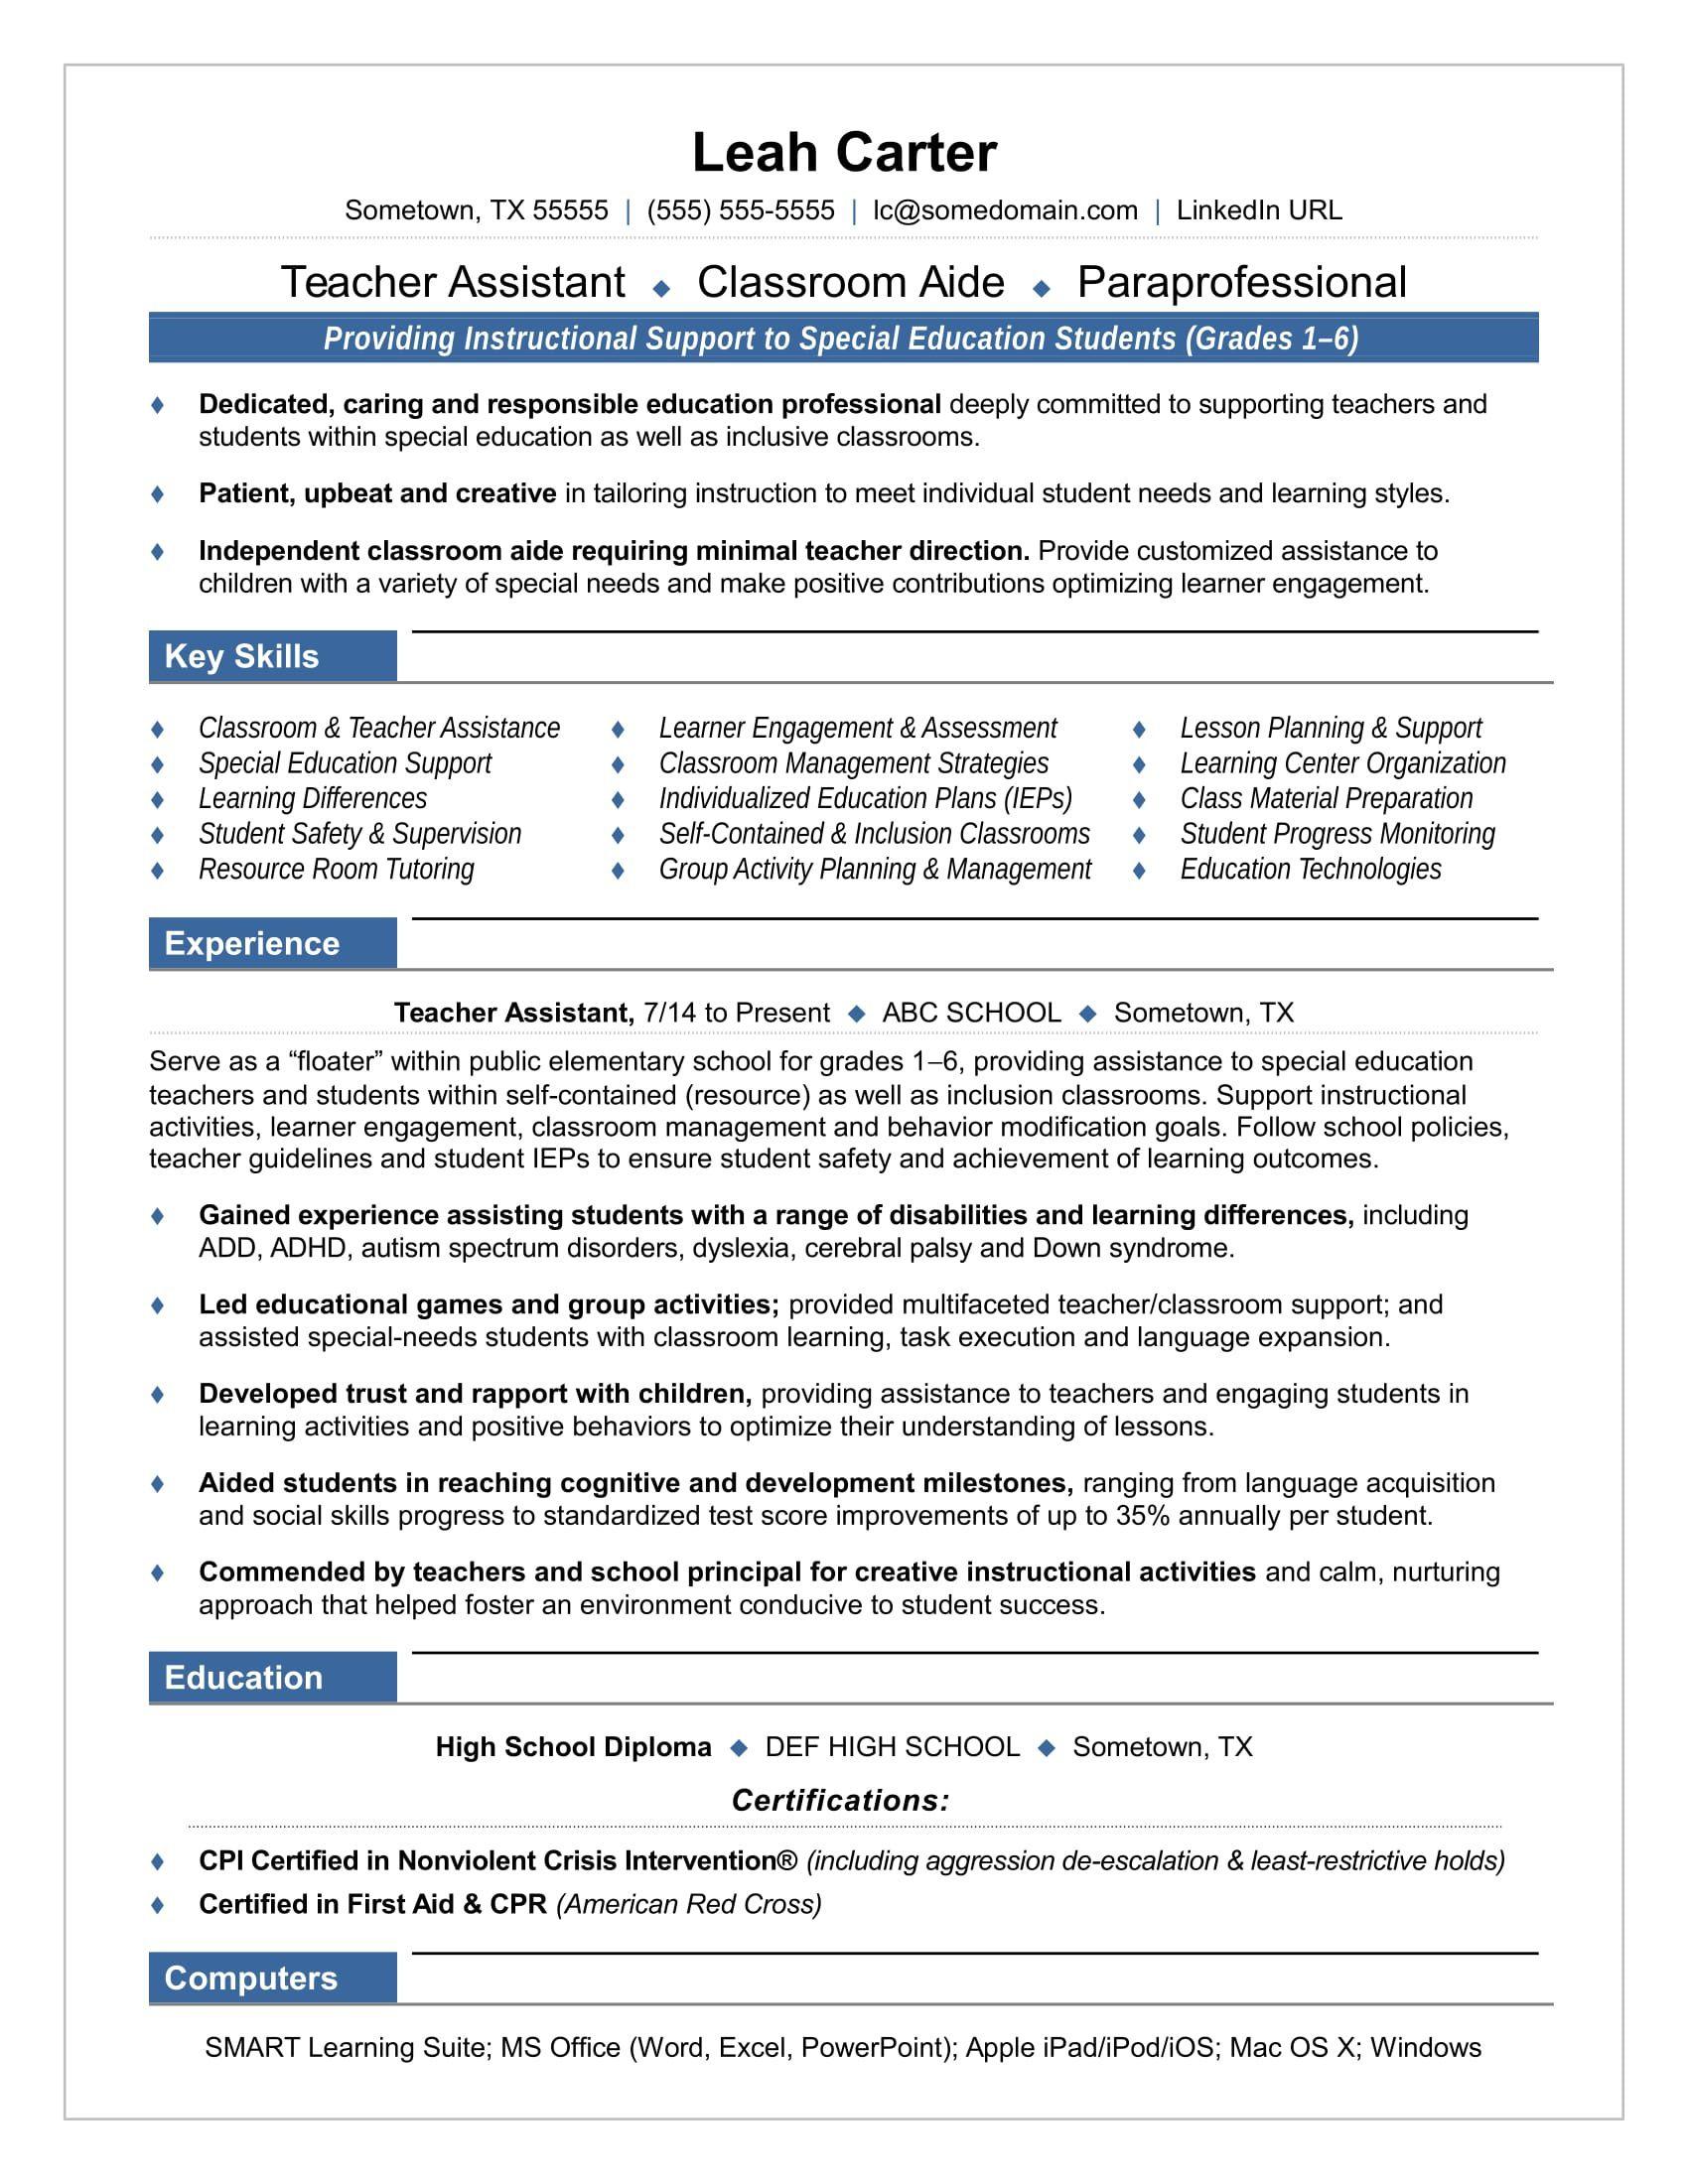 007 Simple Cv Template For Teaching Highest Clarity  Sample Teacher Assistant Modern Word Free Download JobFull